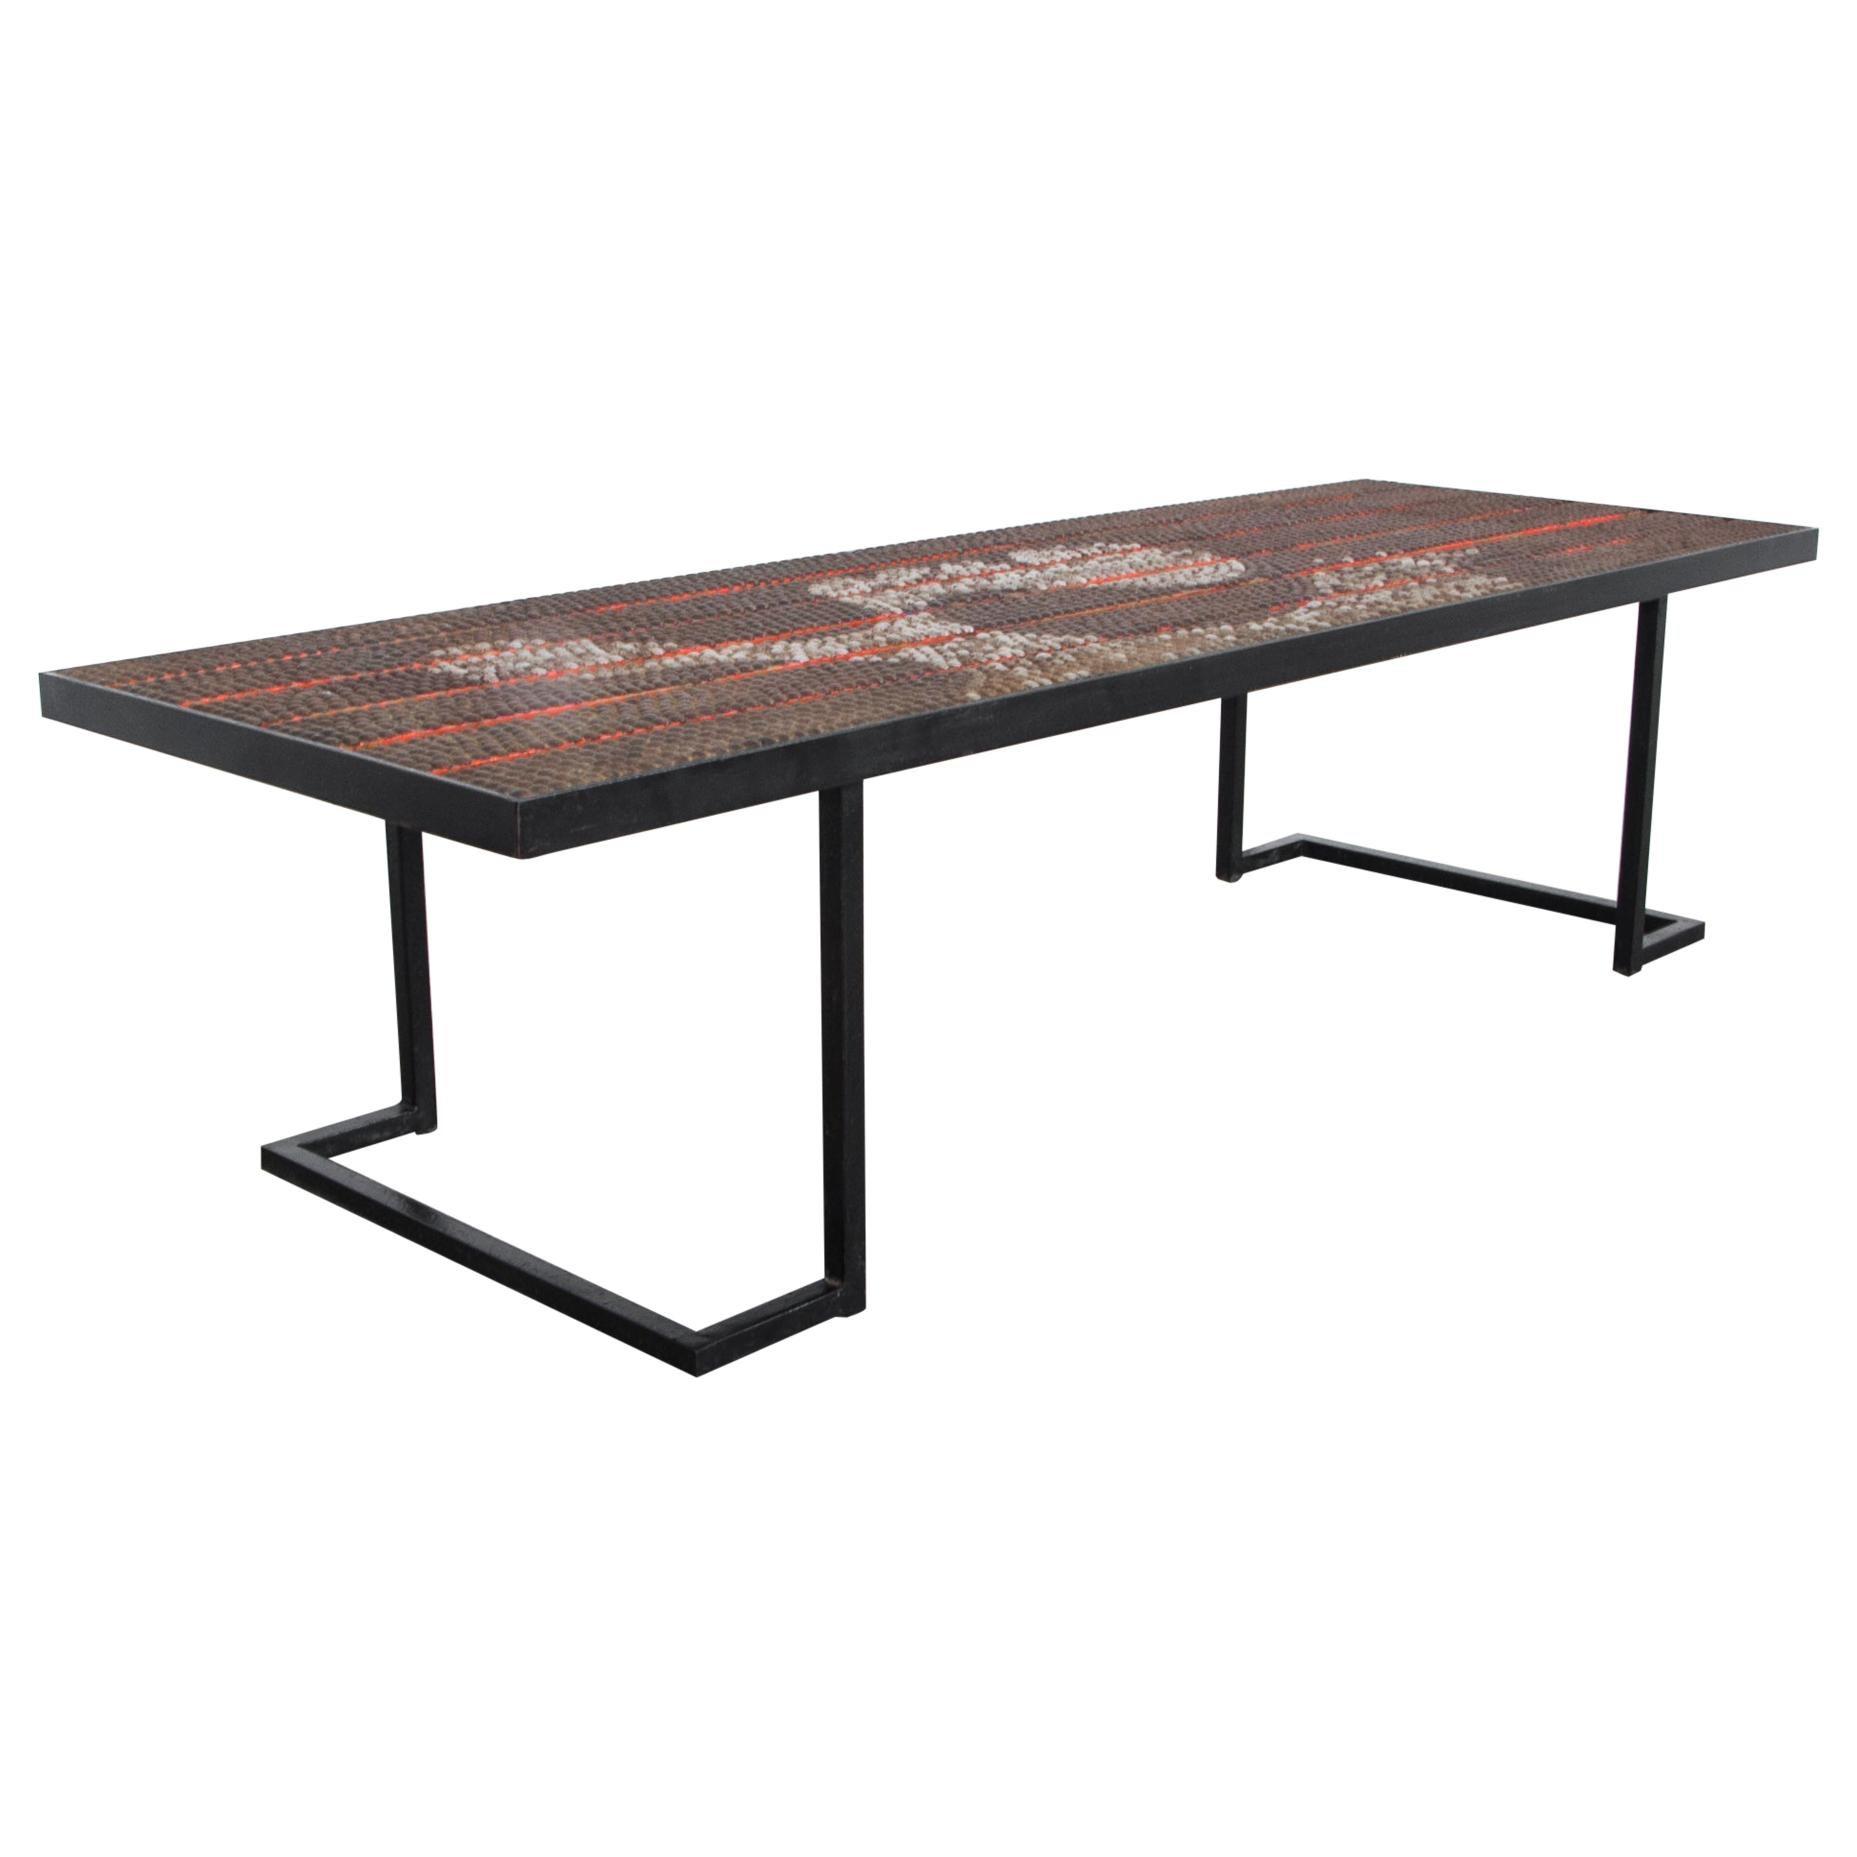 1960s Rare Midcentury Metal Coffee Table